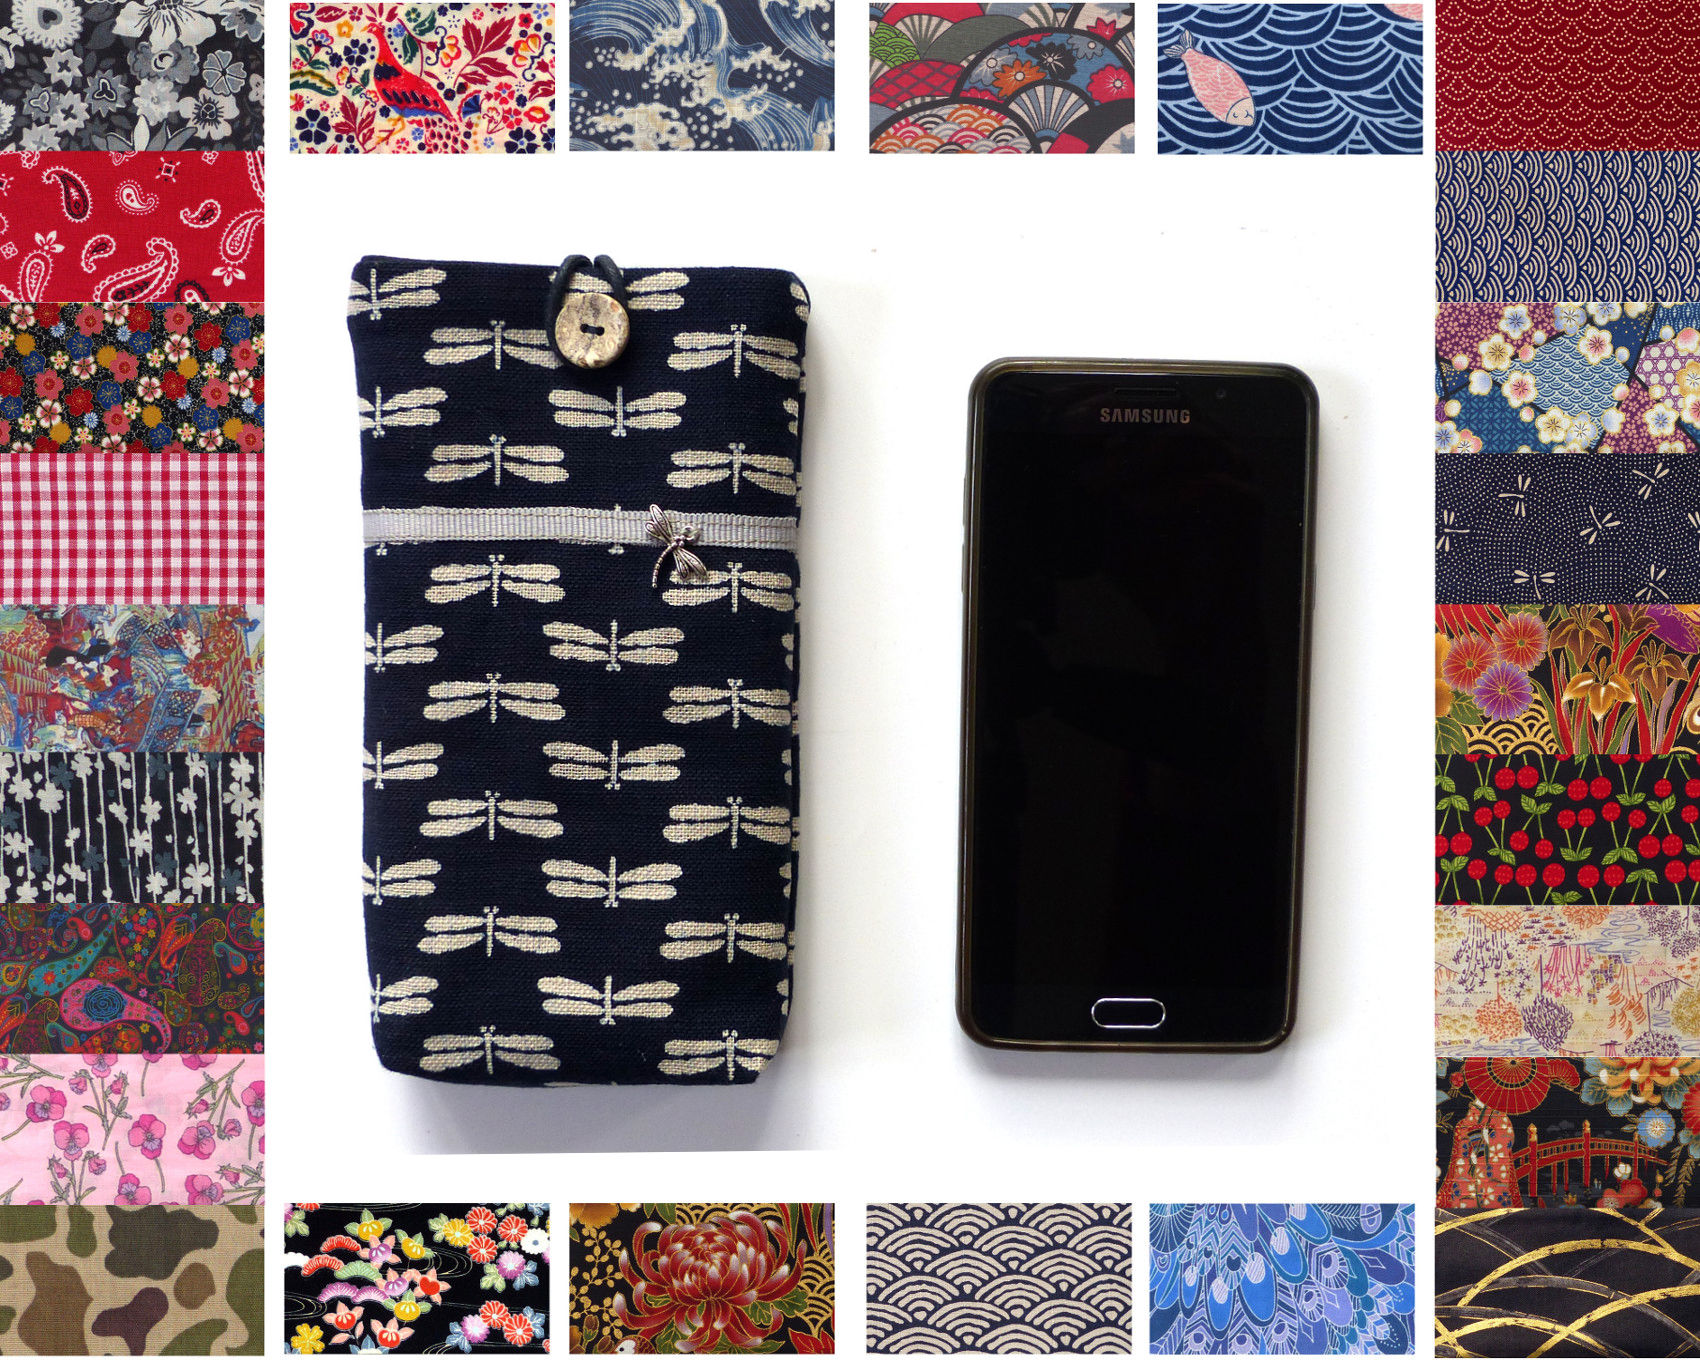 22994c9f0 custom mobile phone soft case,; 100+ fabric options like Liberty, tropical,